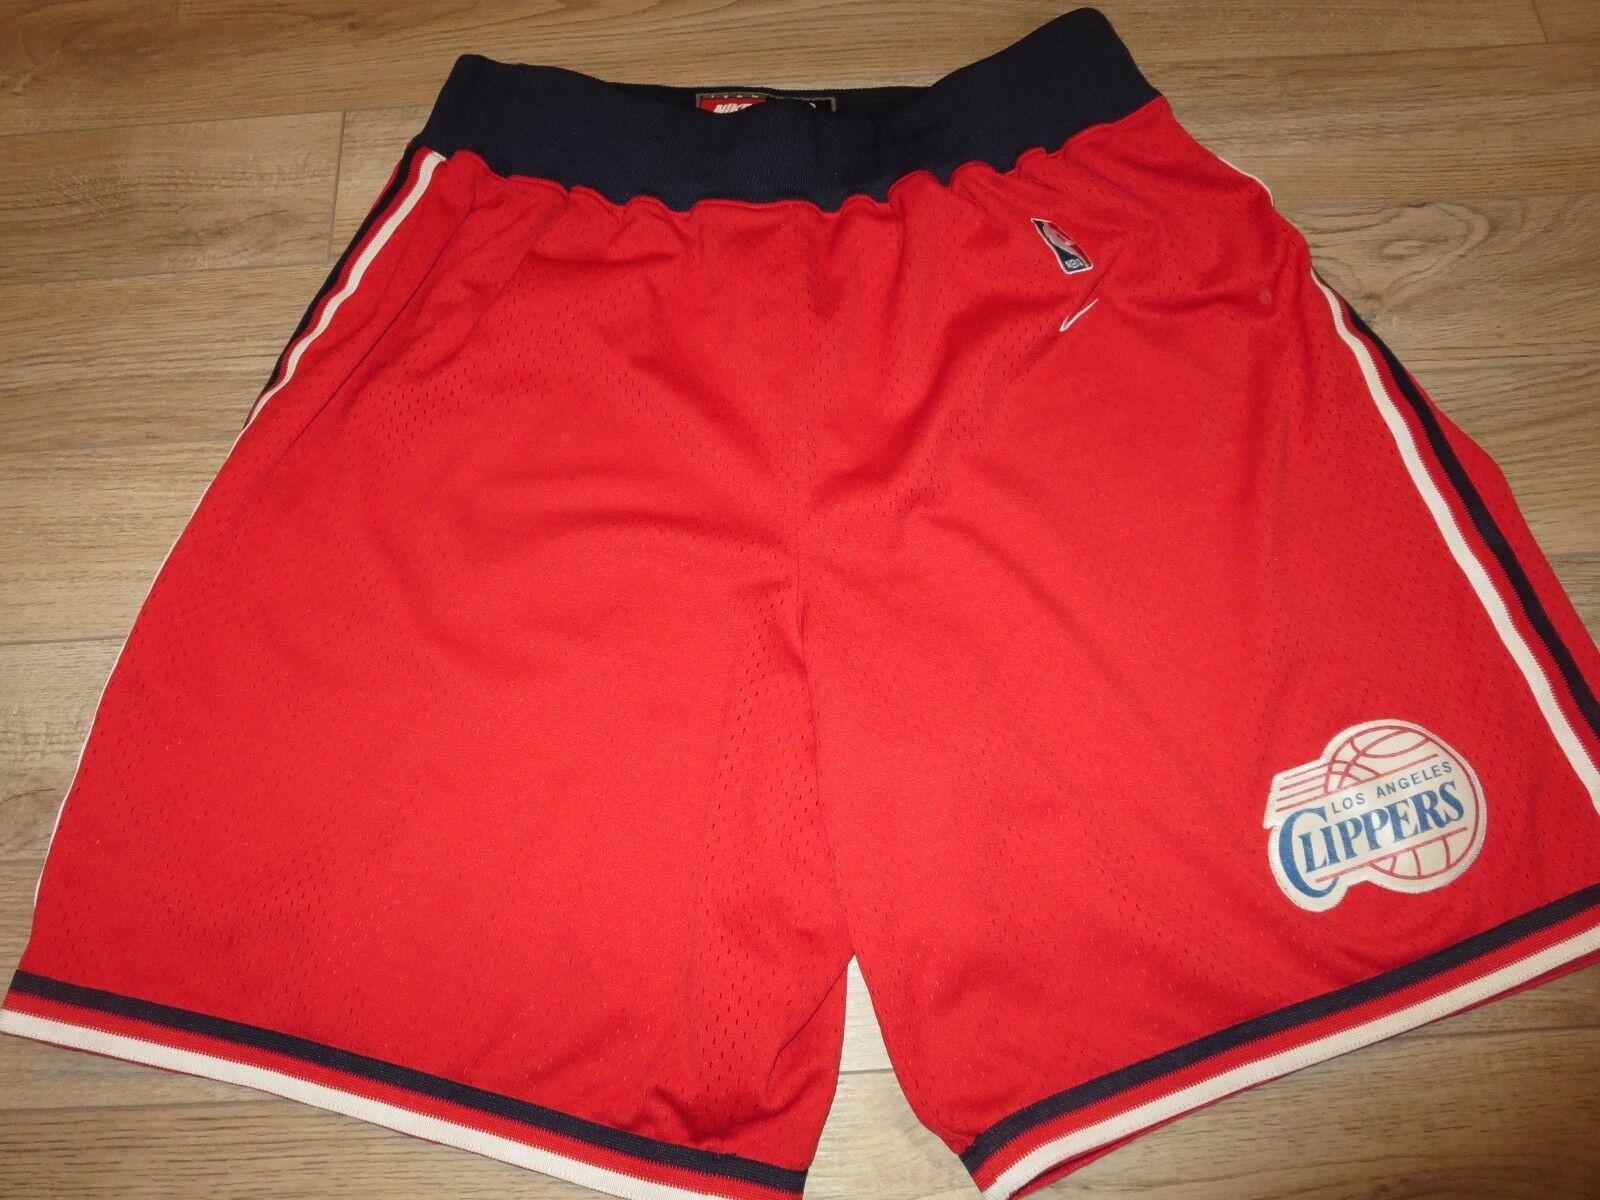 La Clippers NBA Spiel Basketball Adidas Retro Retro Retro Rewind Shorts XXL 9a2165